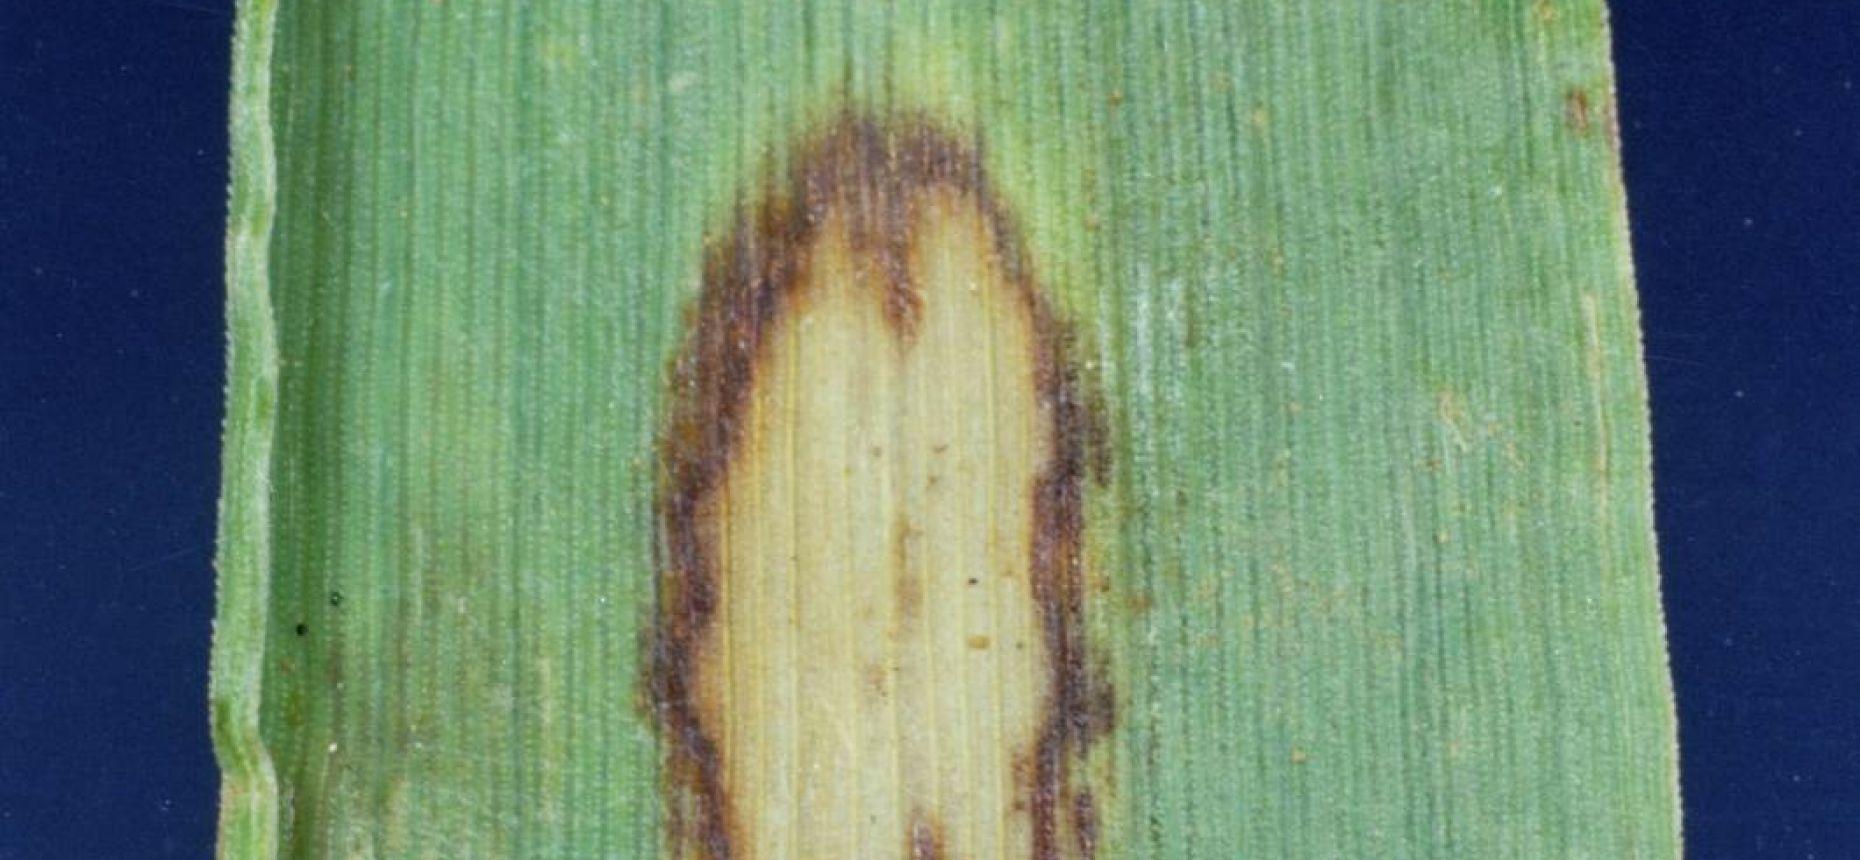 Ринхоспориоз - Rhynchosporium secalis (Oudem.) J. J. Davis (=Marssonia secalis Oudem.)